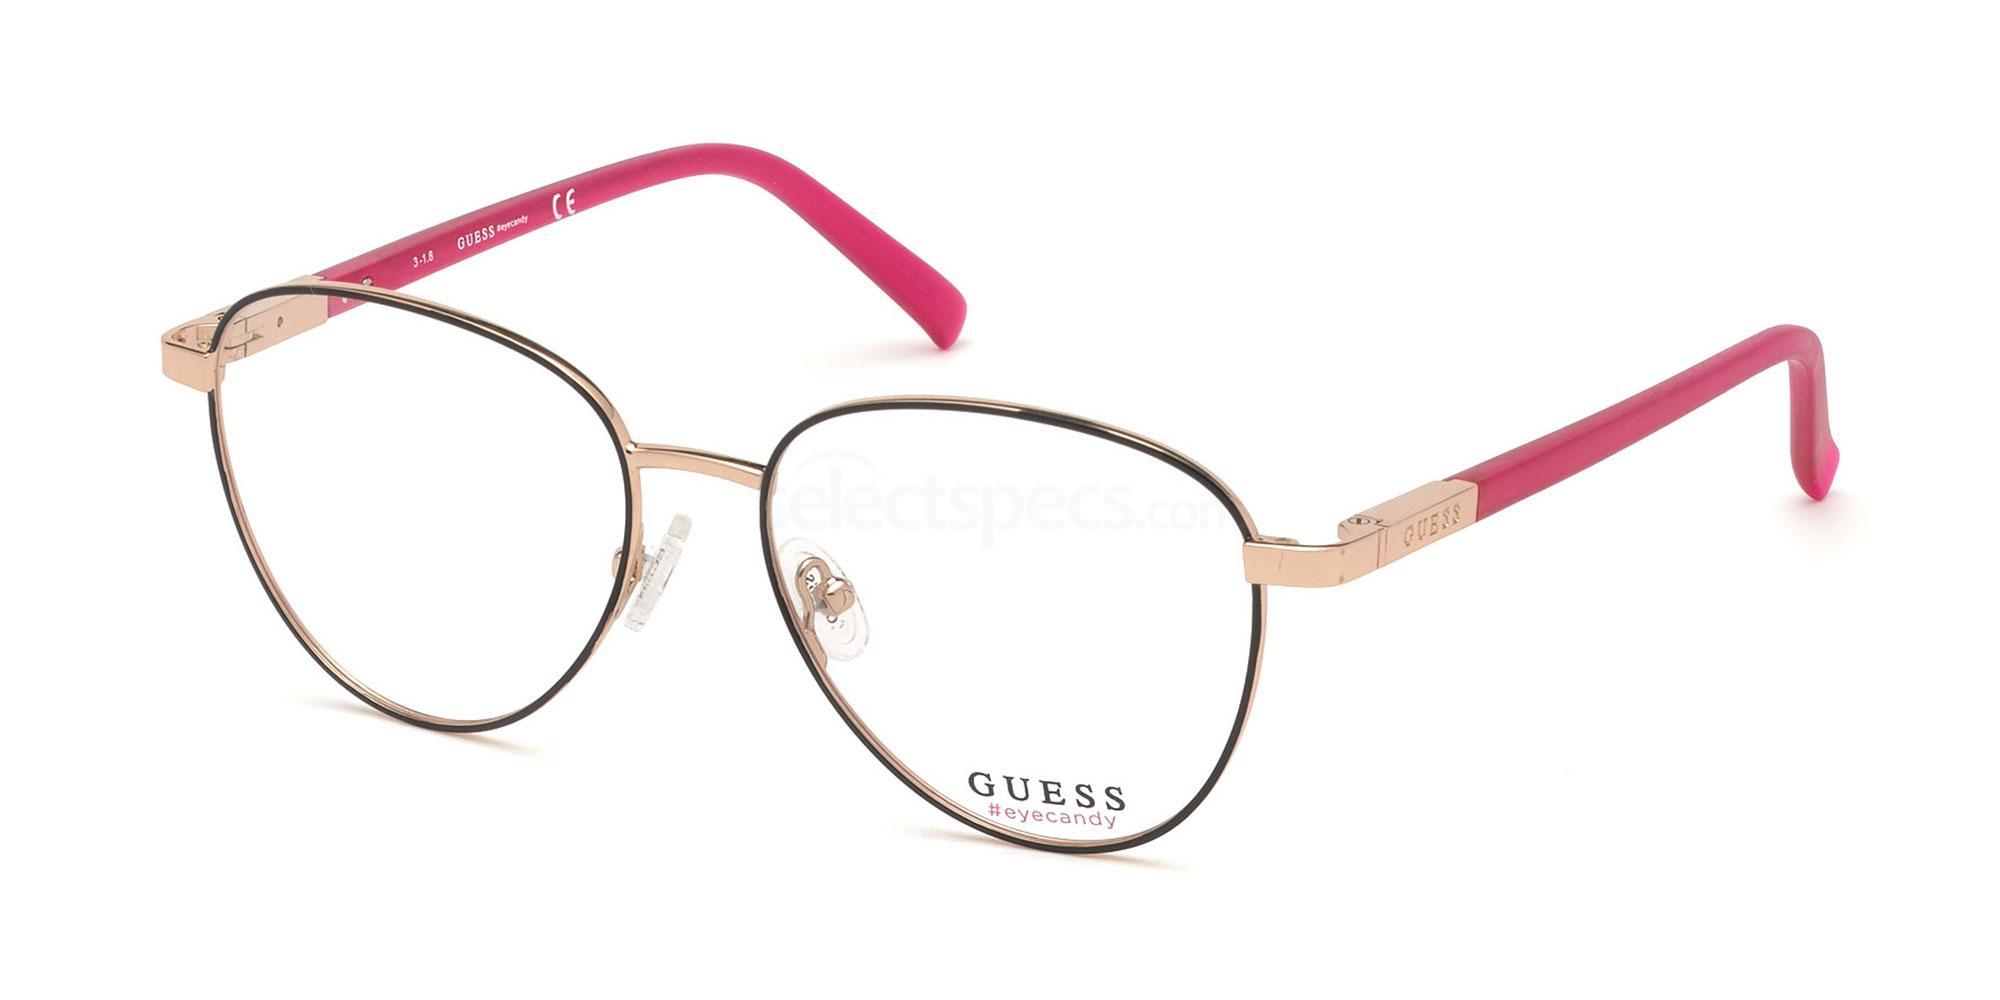 001 GU3037 Glasses, Guess